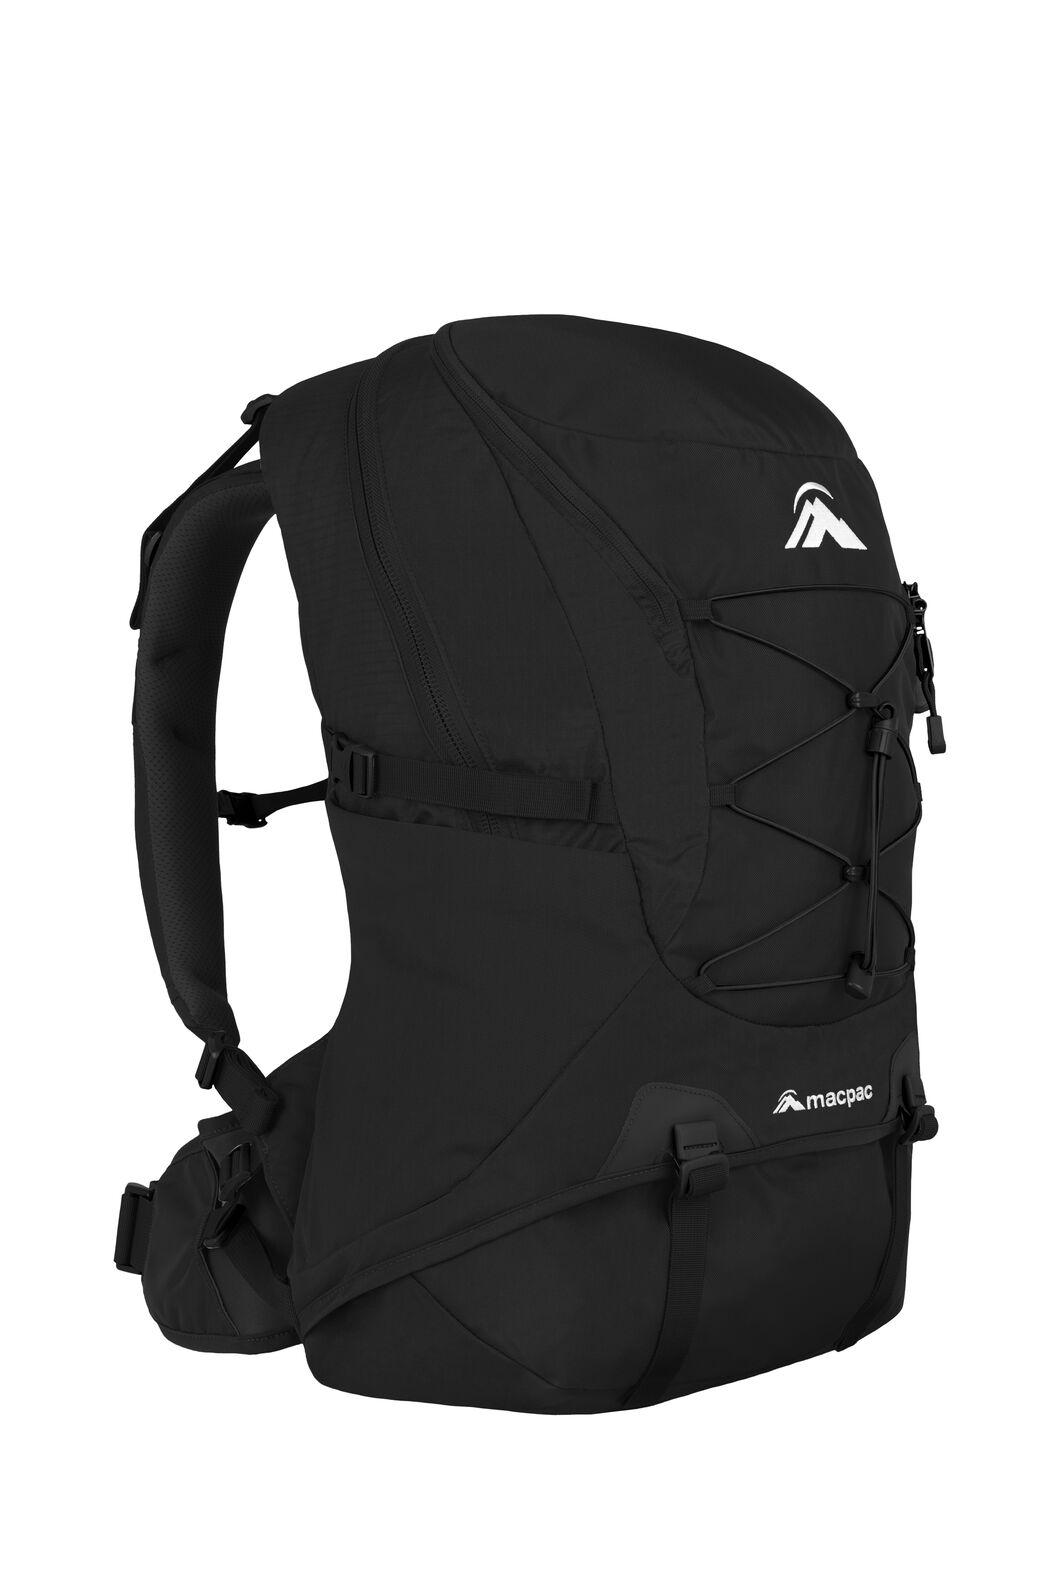 Macpac Voyager 35 Pack, Black, hi-res